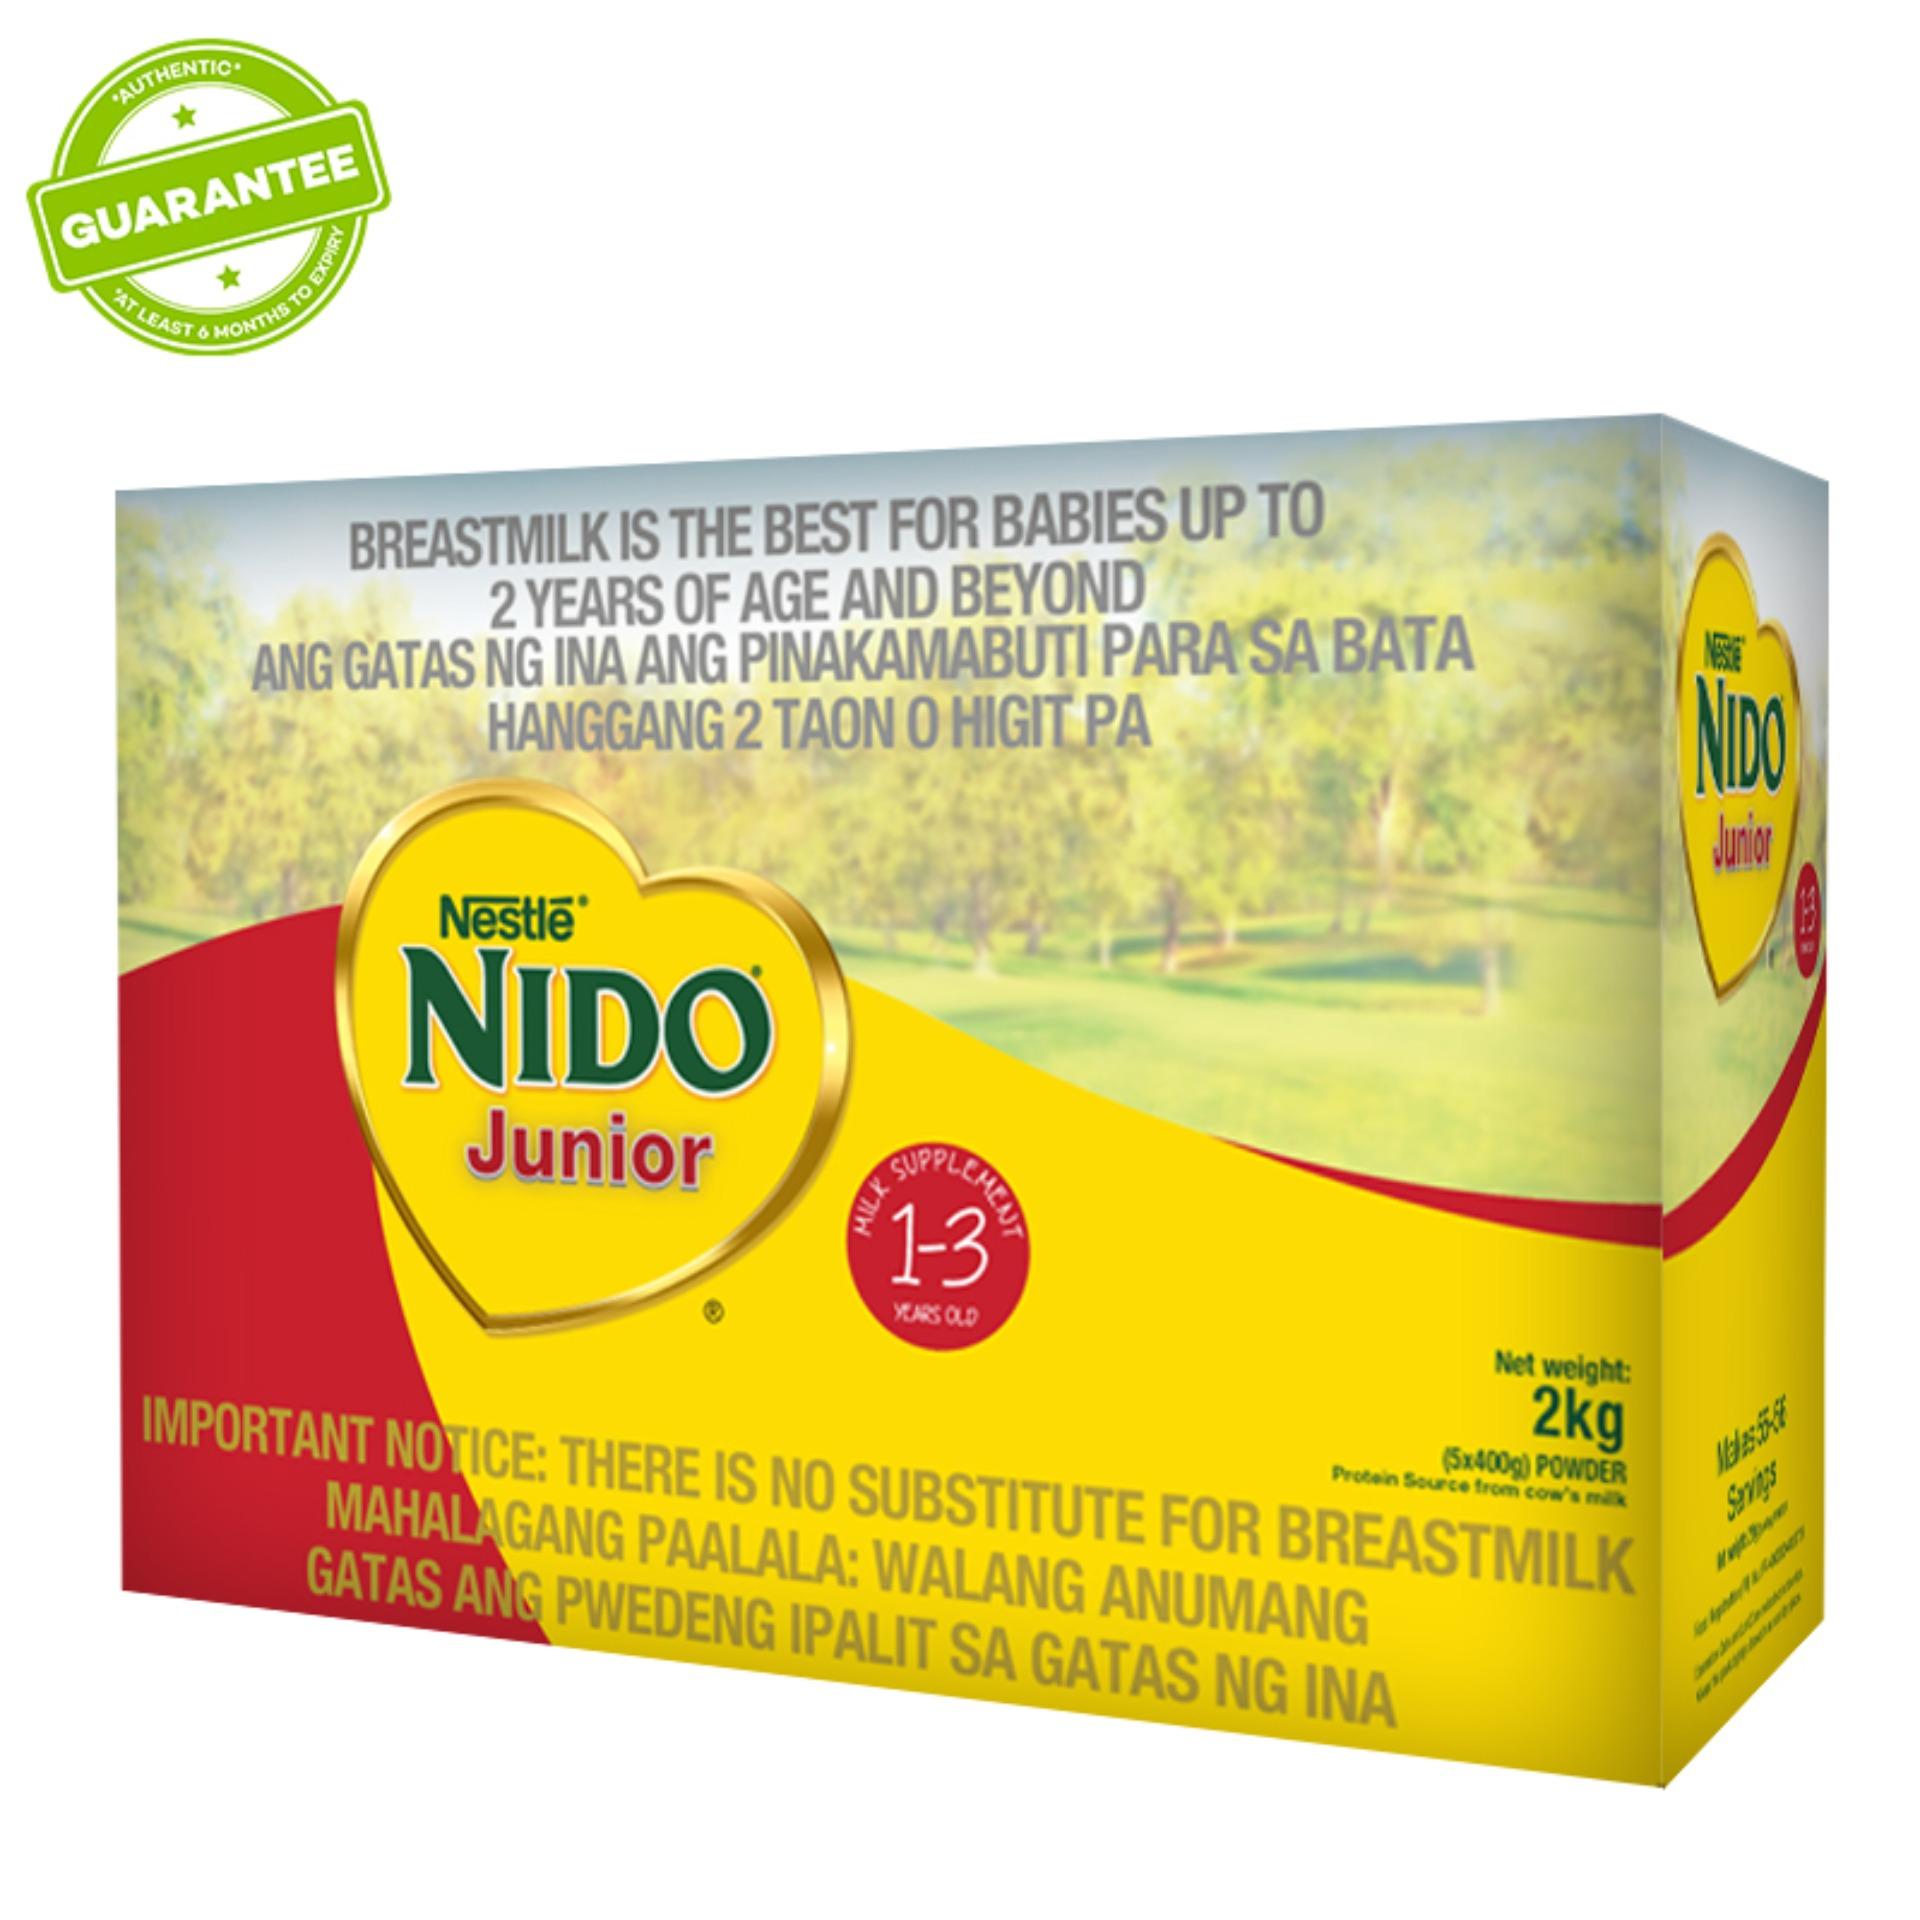 NIDO Junior Advanced Protectus Milk